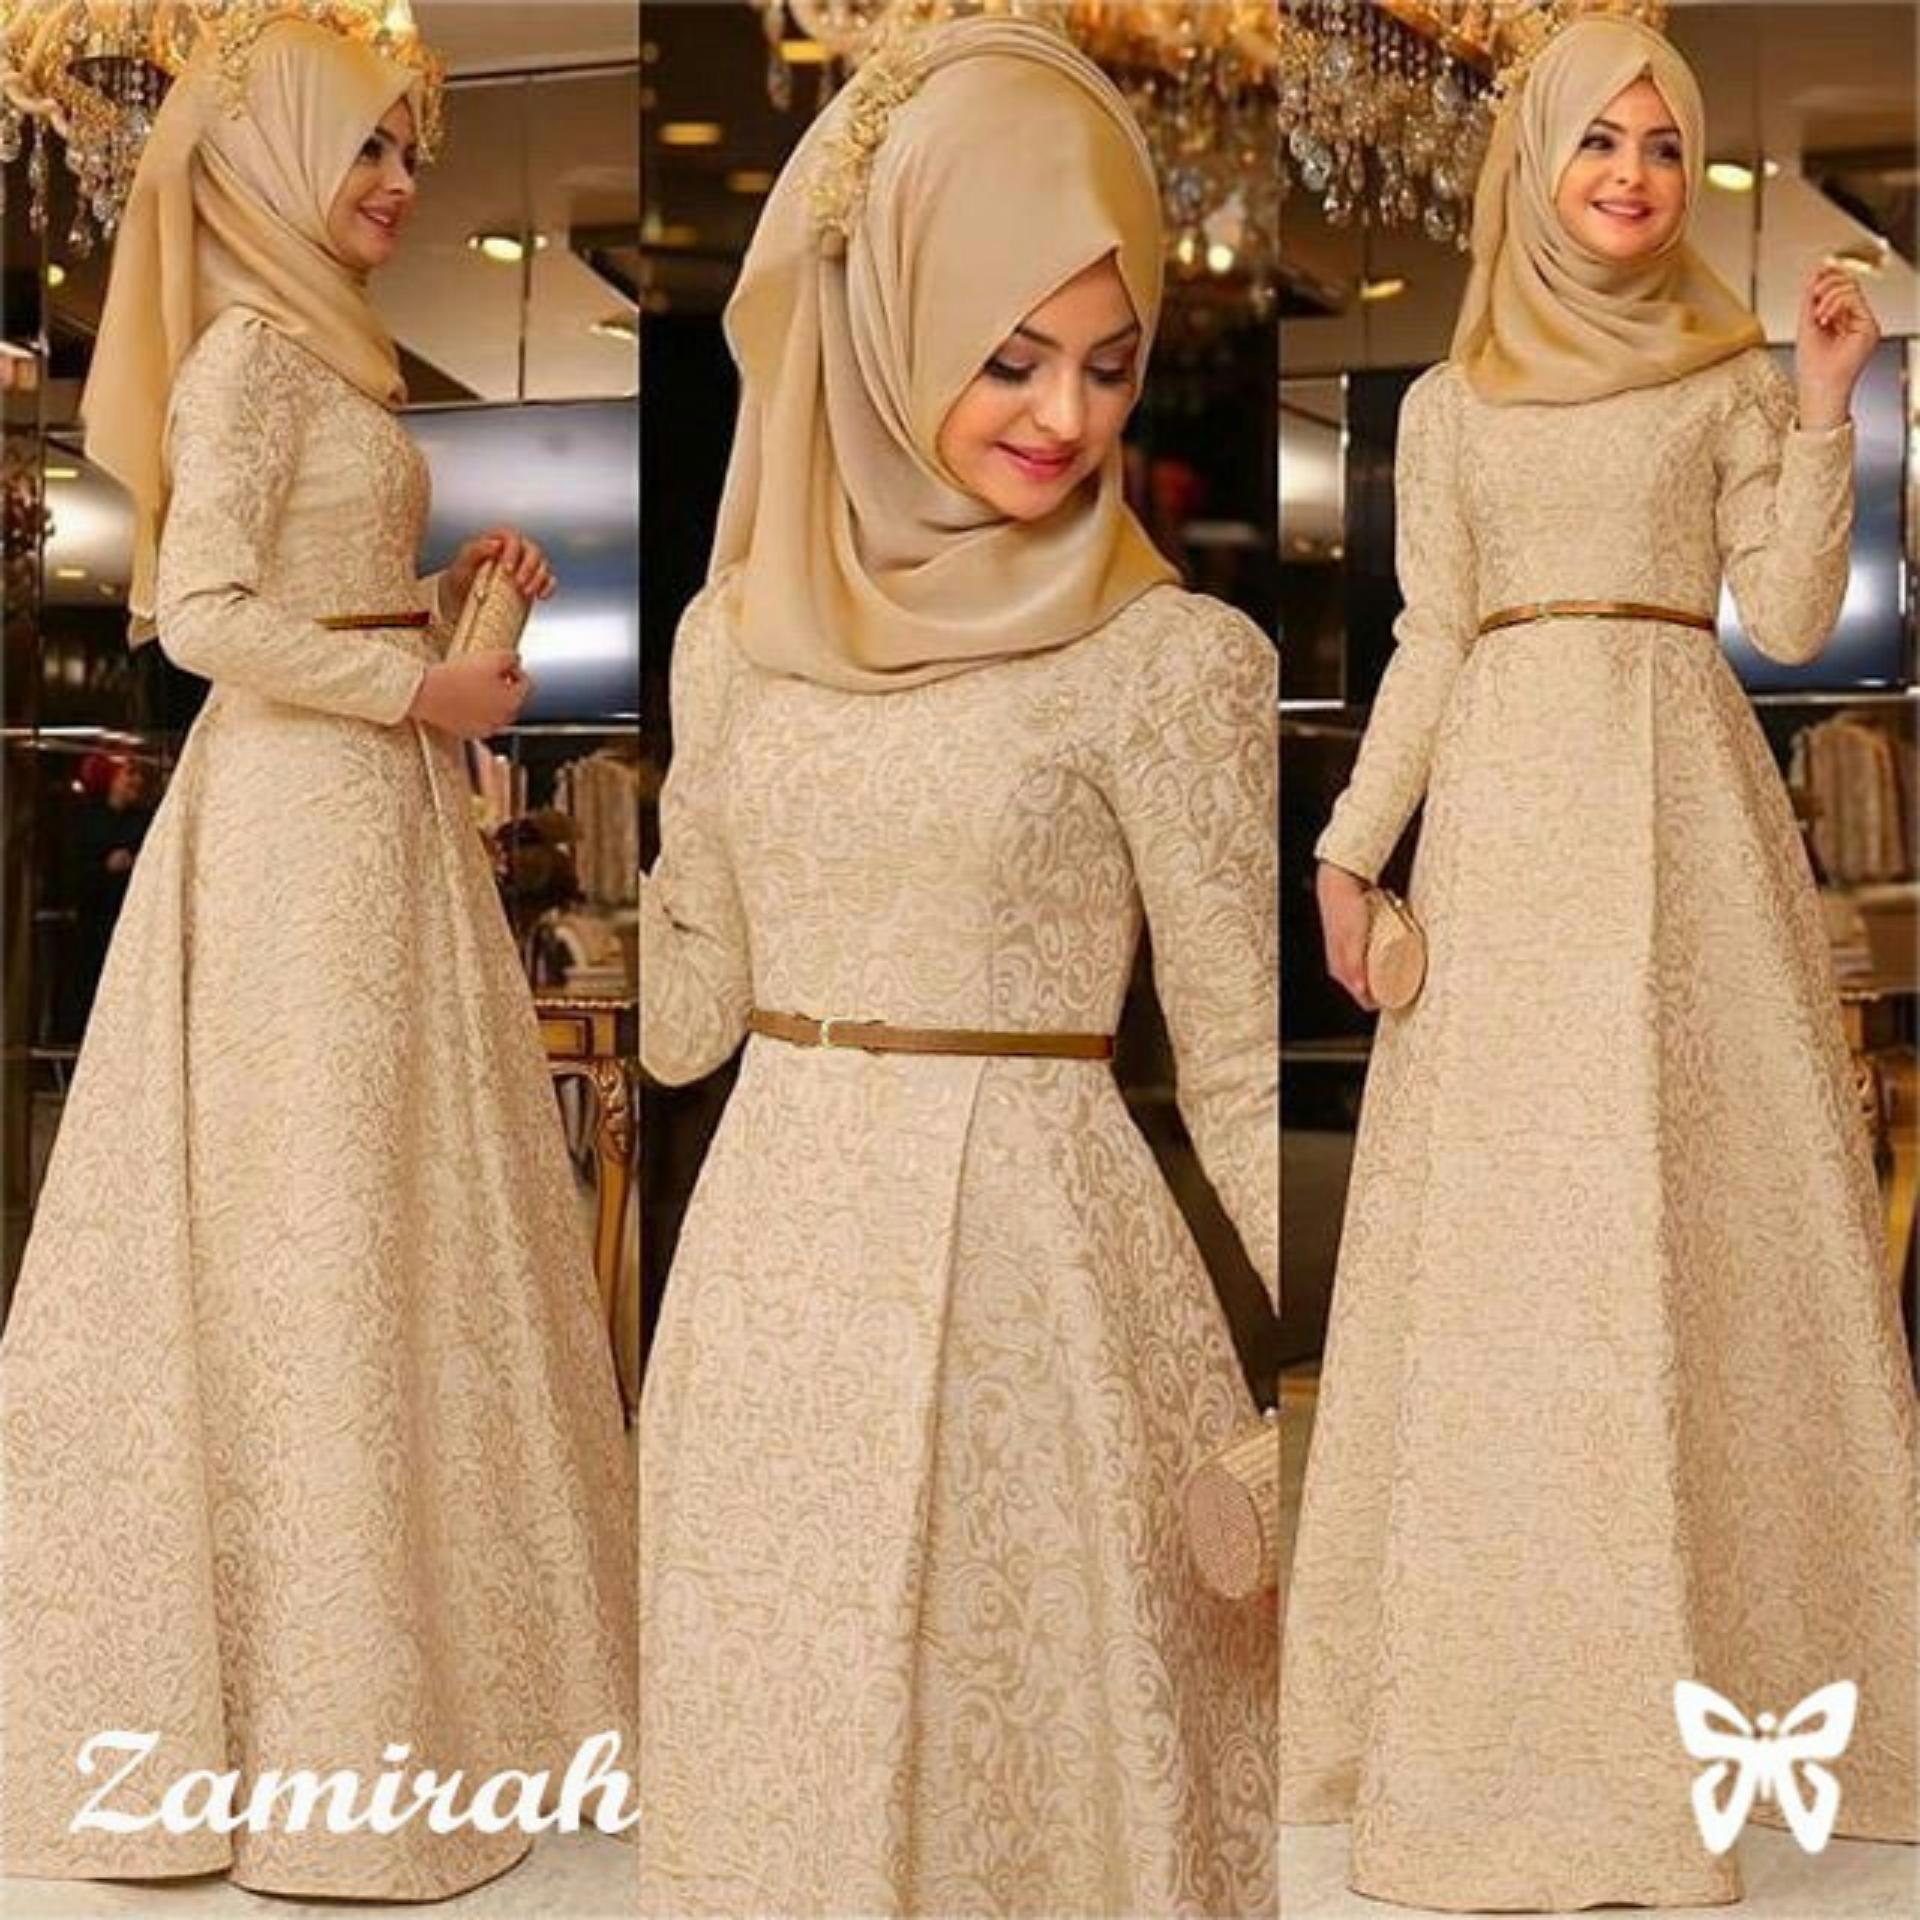 Baju Wanita Shop Dress Gamis Muslim Mirah / Hijab Muslim / Muslim Syari Hijab Syar'i / Busana Muslimah / Kebaya Modern Lebaran (Mirahza)  SS - Mocca / Gaun Pesta Lengan Panjang 2018